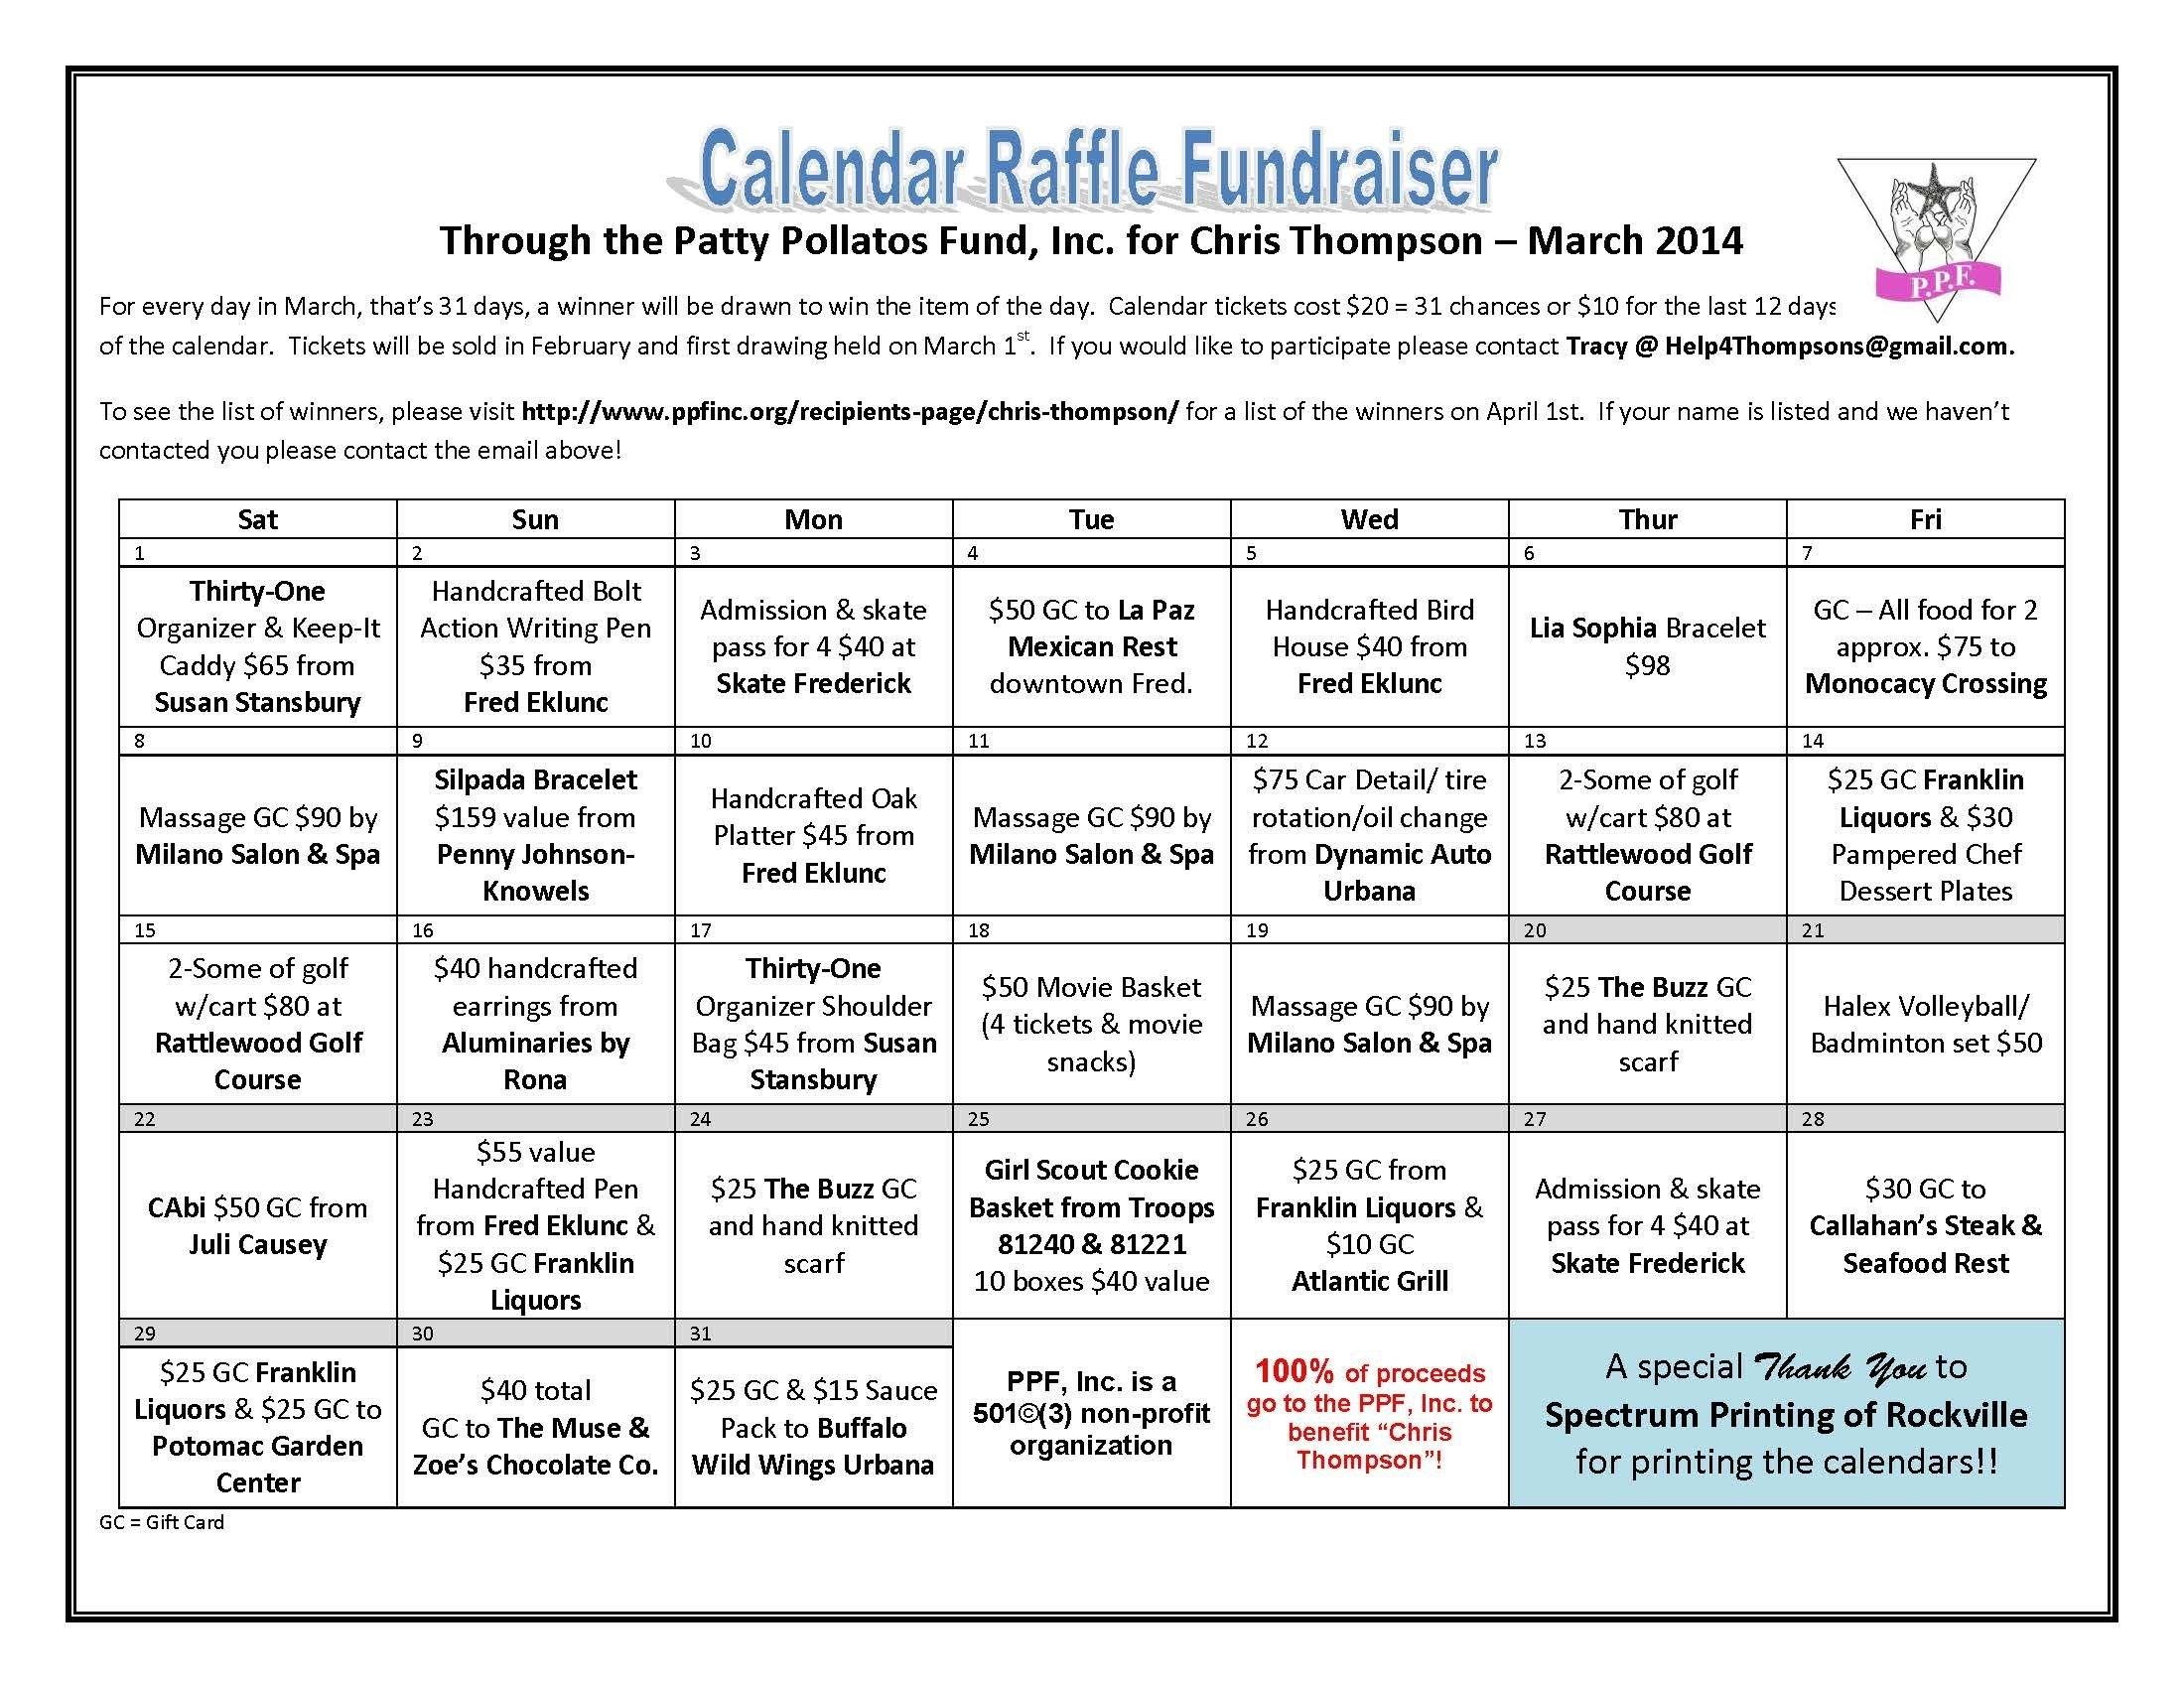 Thompson-Raffle-Fundraiser-Calendar-Final 2,200×1,700